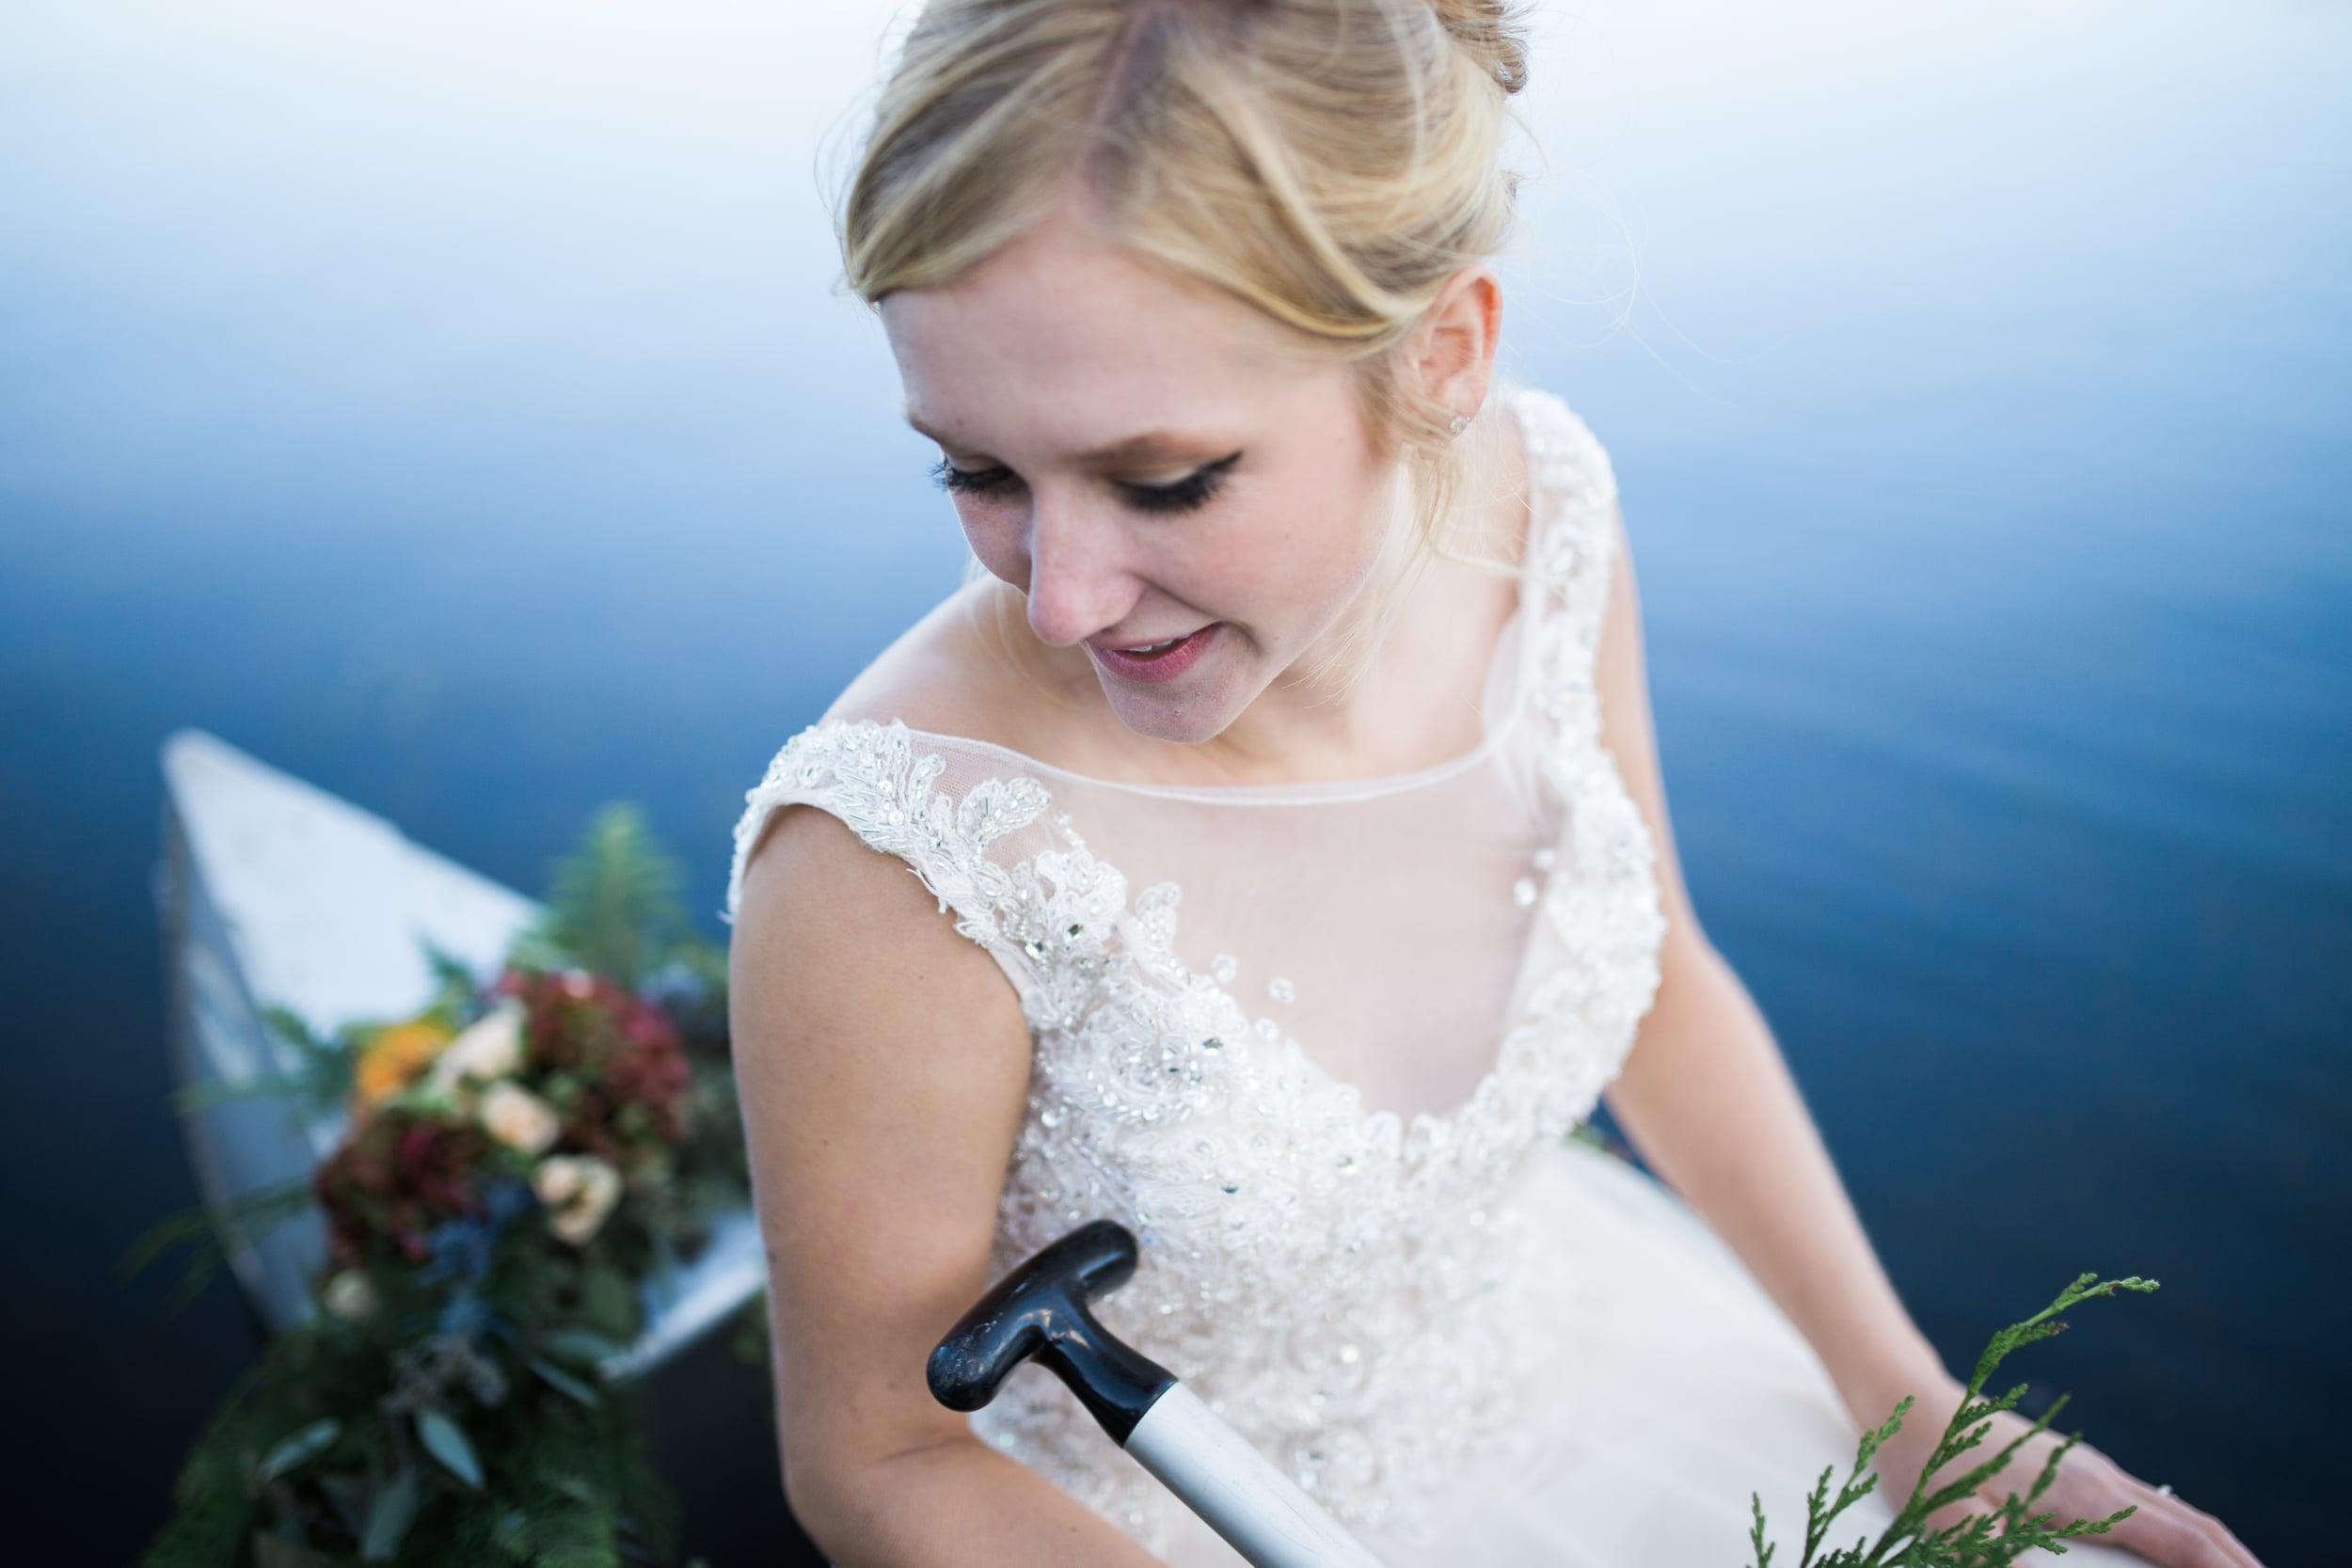 Colorado Mountain Wedding Photographer - bride with canoe paddle